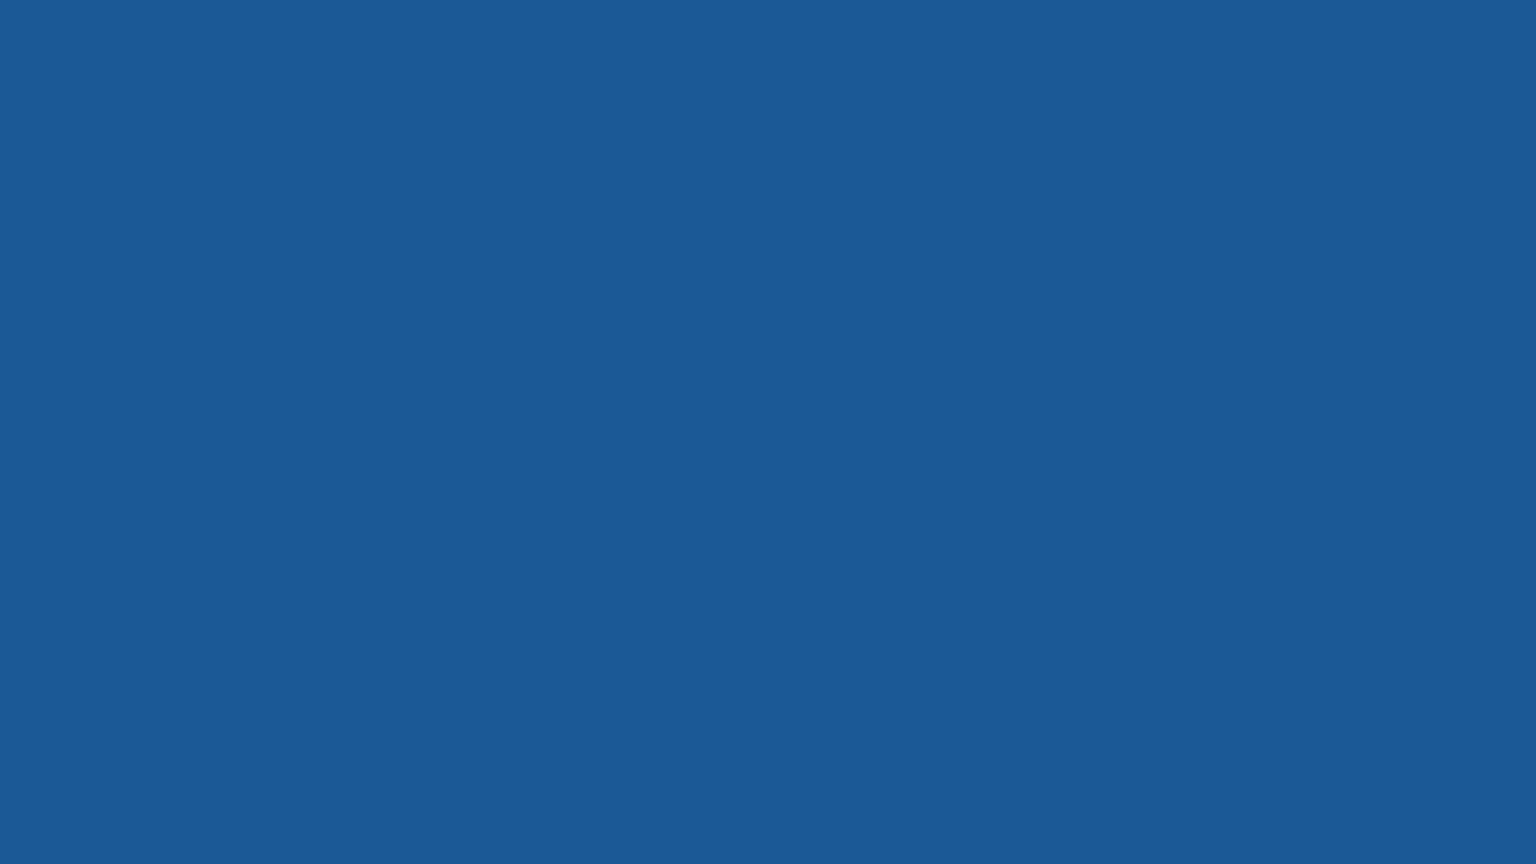 Free Download Desktop Background Only Solid Colors Windows 7 Zoom Wallpapers 1680x1050 For Your Desktop Mobile Tablet Explore 47 Classic Windows Desktop Wallpaper Wallpaper For Windows Windows Wallpaper Desktop